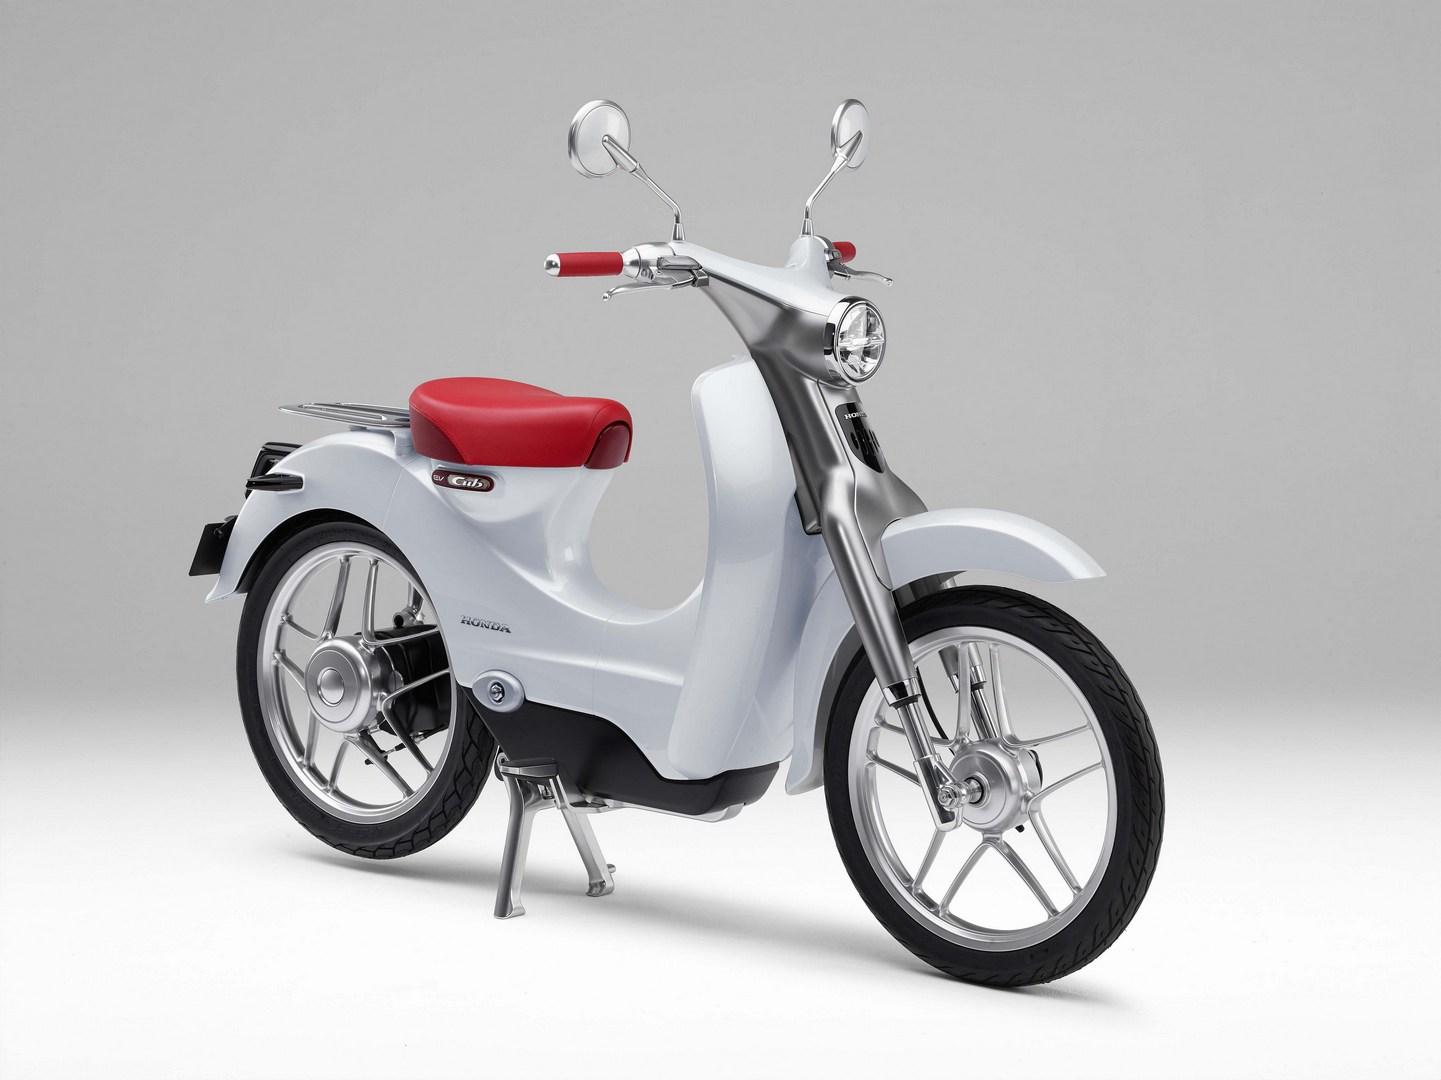 Honda Ev Cub Electric Scooter